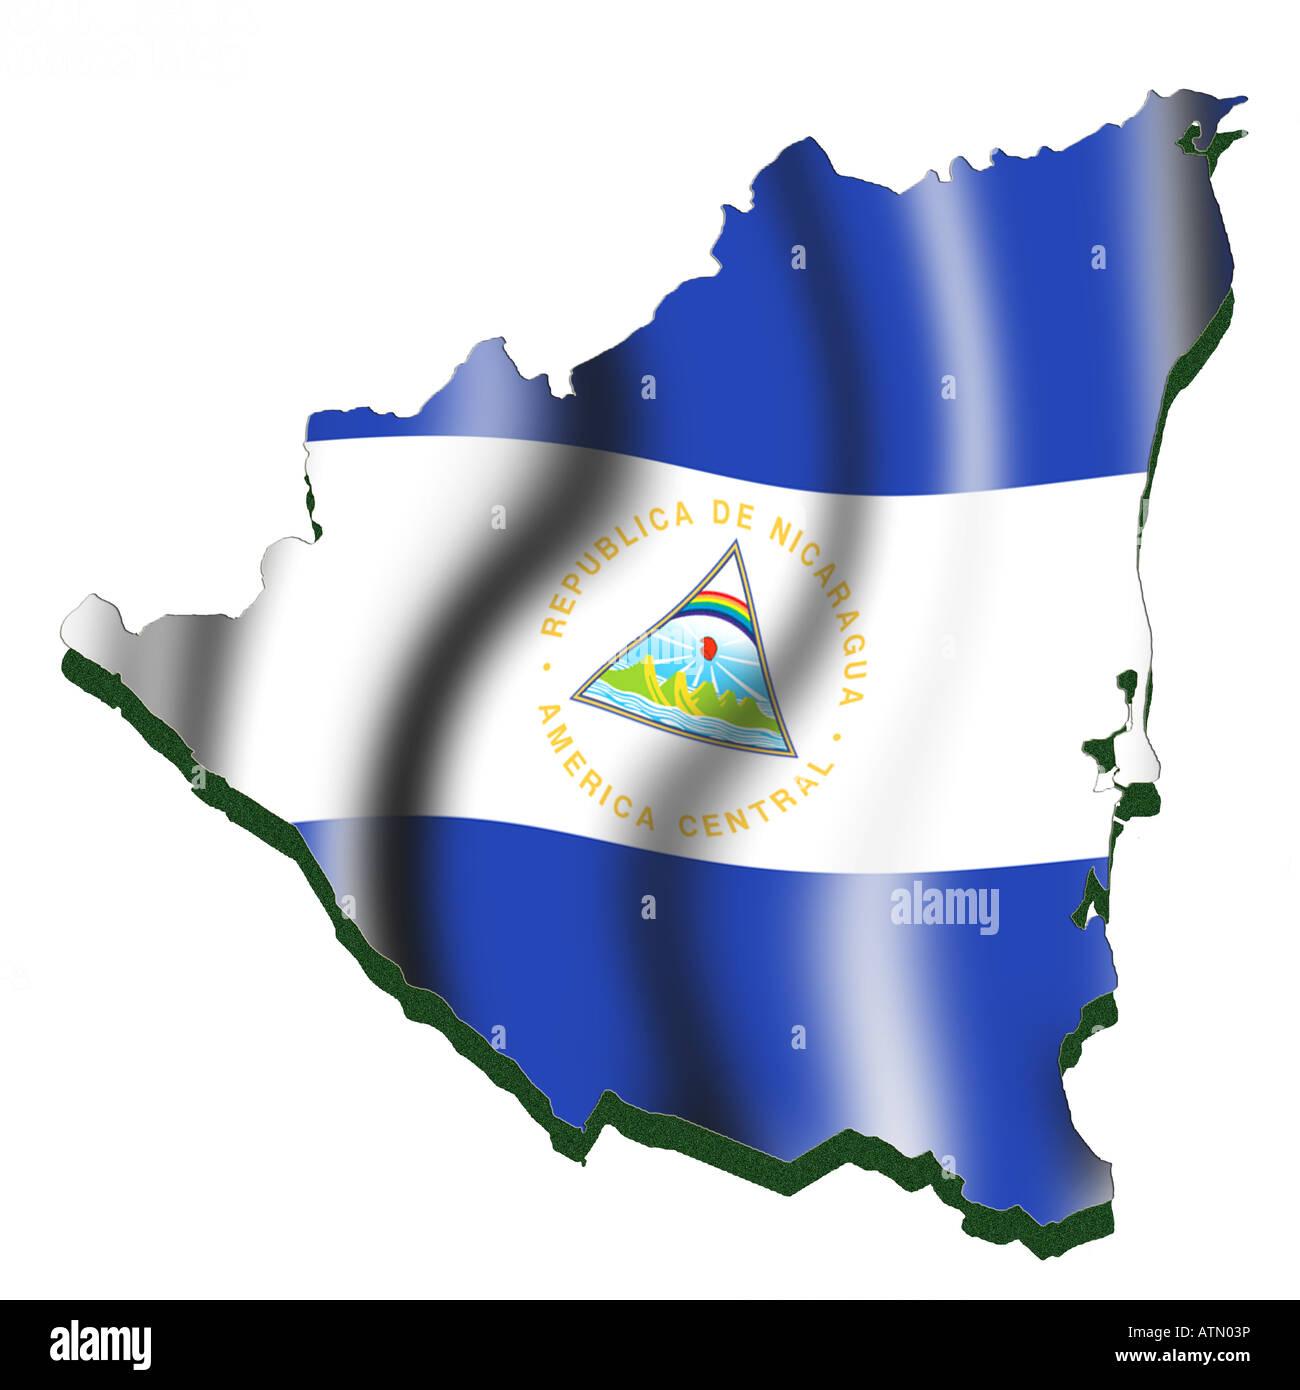 Outline Map And Flag Of Nicaragua Stock Photo Alamy